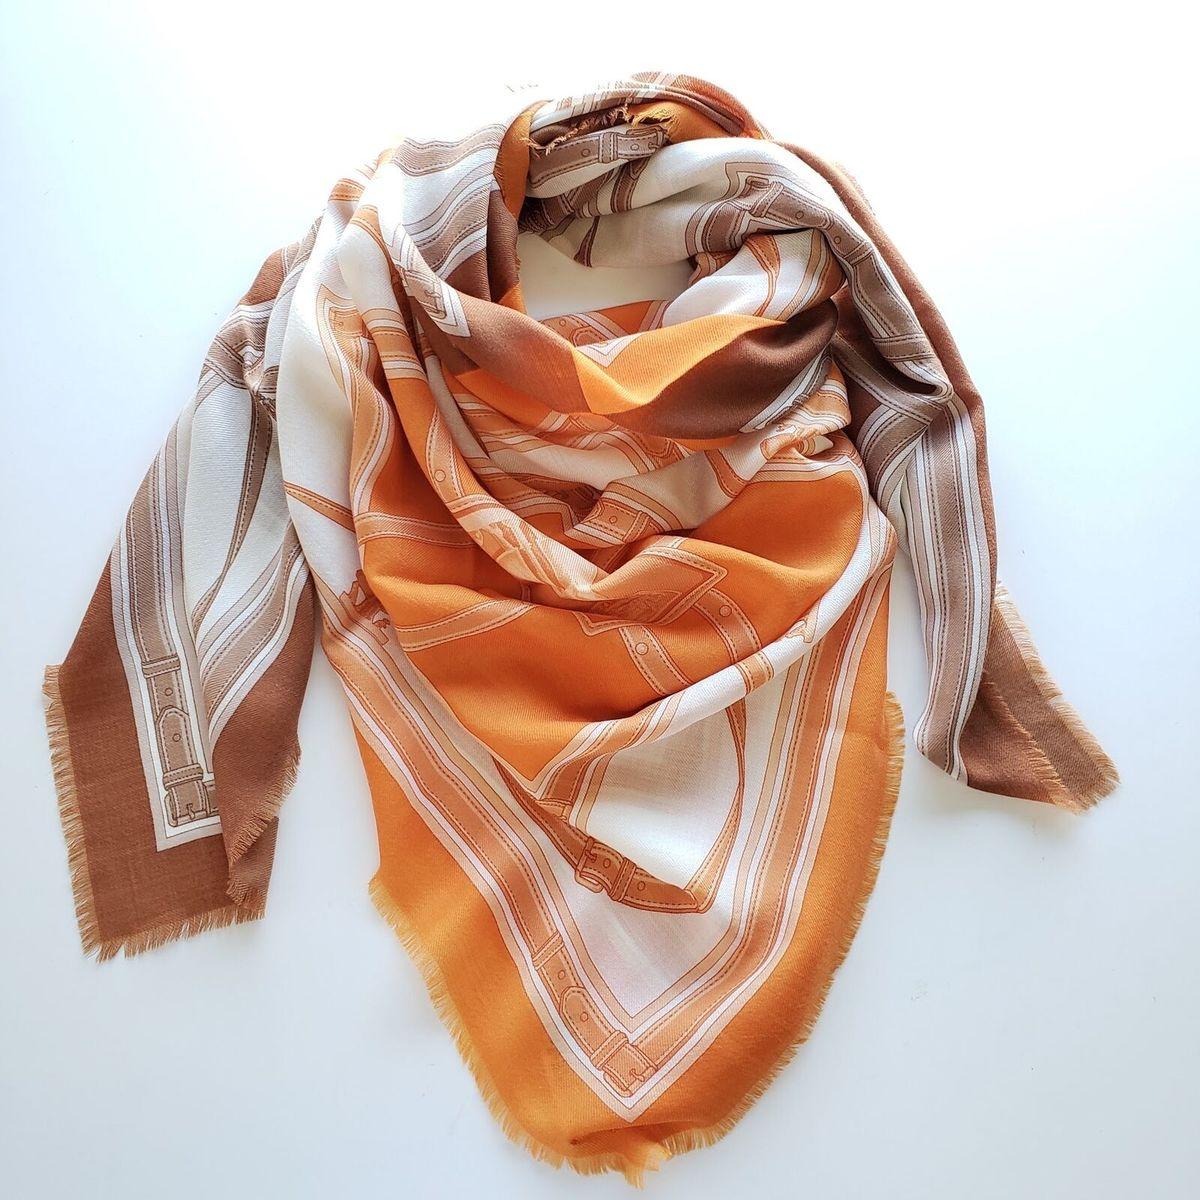 Burberry バーバリー アーカイブ スカーフ プリント カシミア ラージ スクエアスカーフ ブラウン オレンジArchive Scarf Print Cashmere Large Square Scarf Brown/Orange